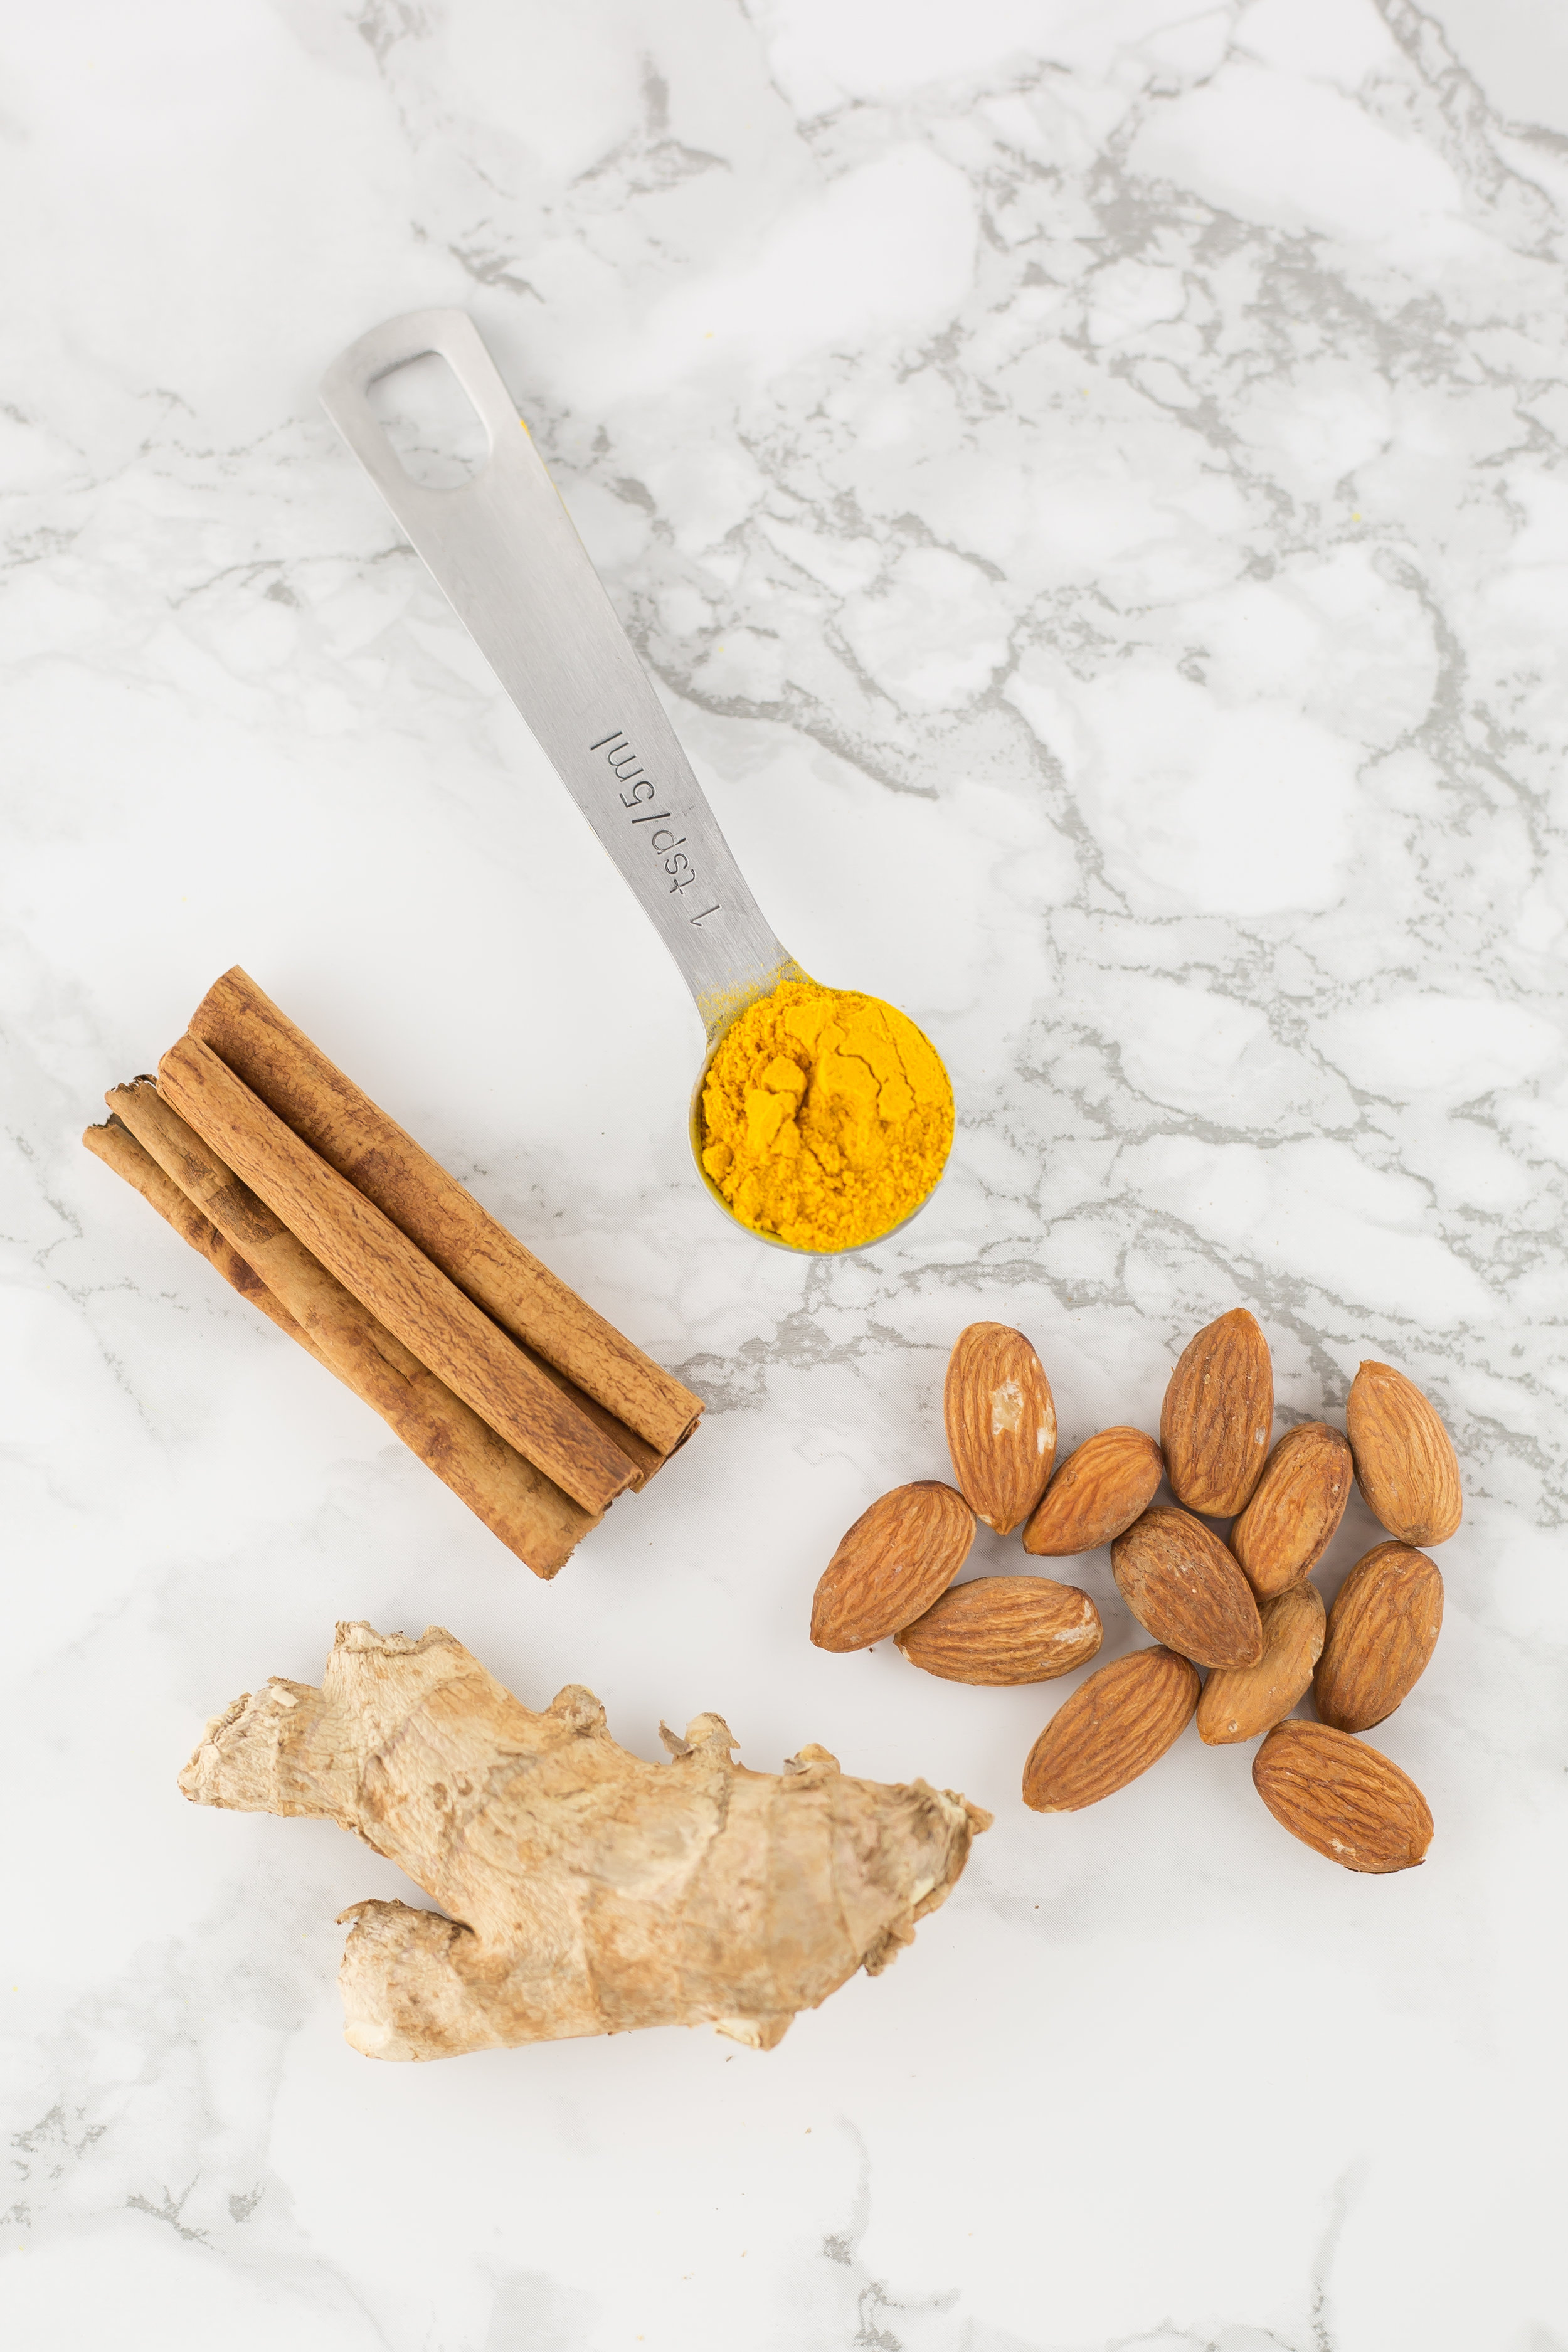 Healthy Recipes, healthy drinks, golden milk, turmeric, benefits of turmeric, turmeric benefits, real food, paleo, whole 30